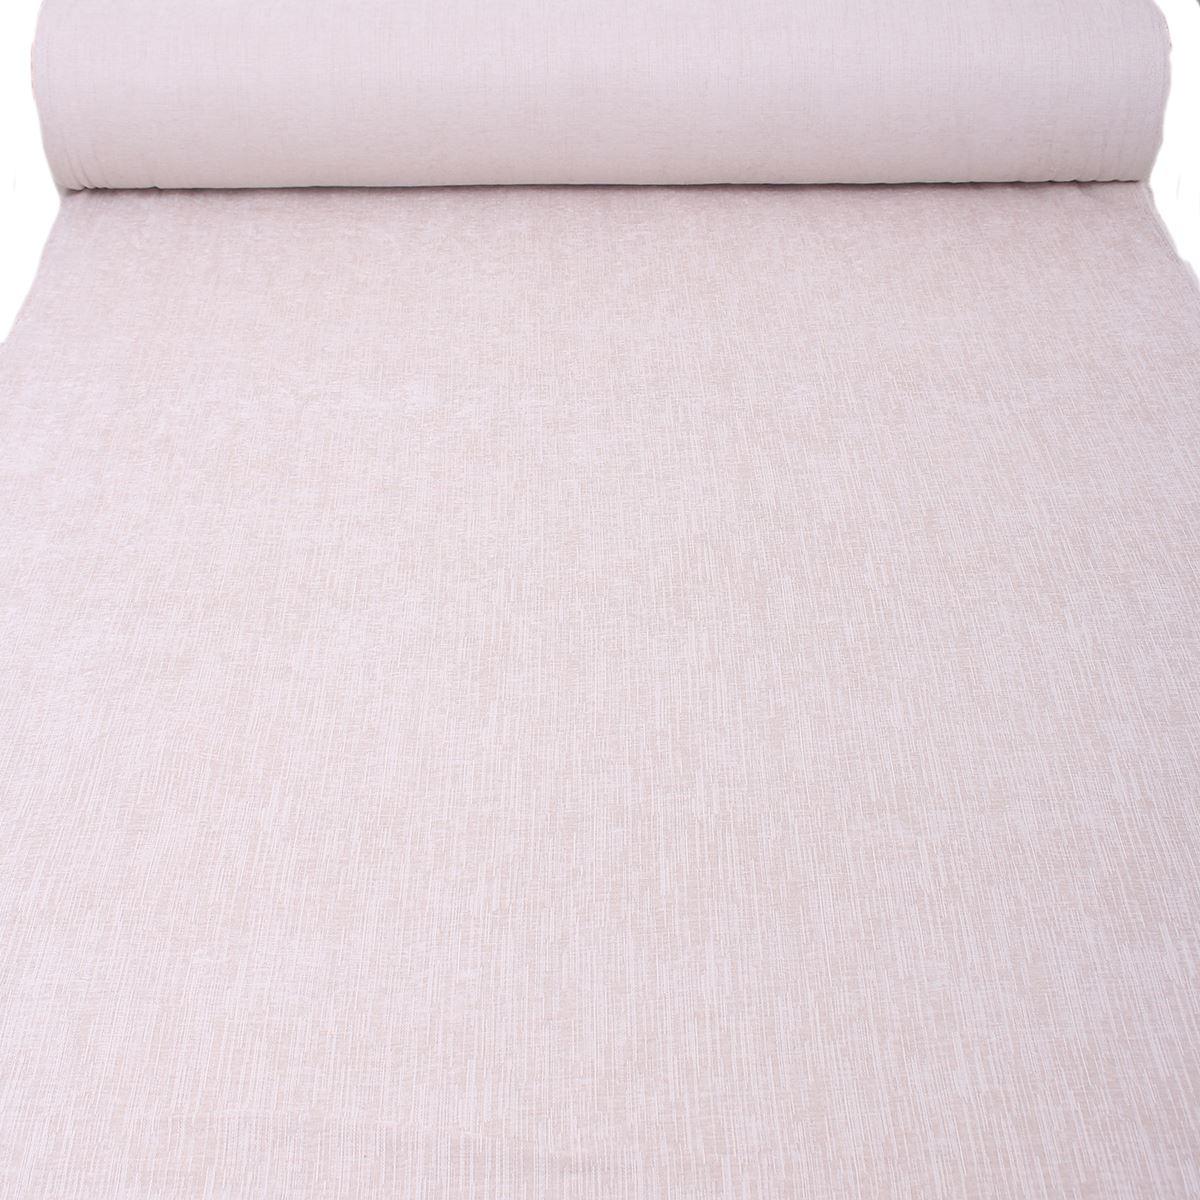 034-Chenille-034-Slubbed-Shabby-Worn-Look-Curtain-Cushion-Sofa-Upholstery-Fabric thumbnail 40